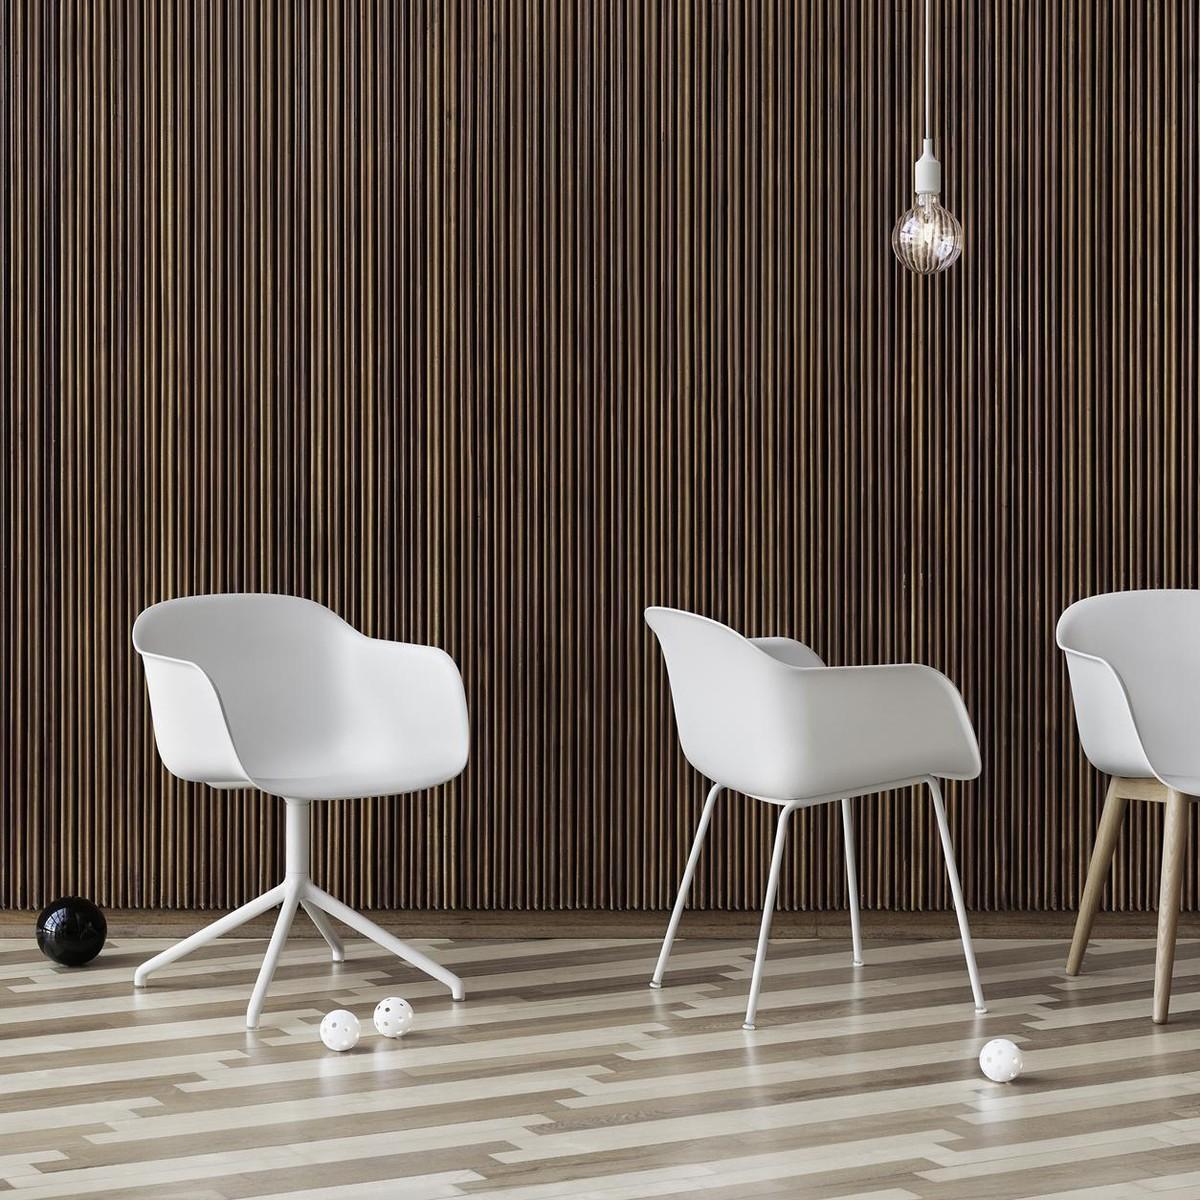 Fiber Chair Swivel Chair Muuto Ambientedirect Com